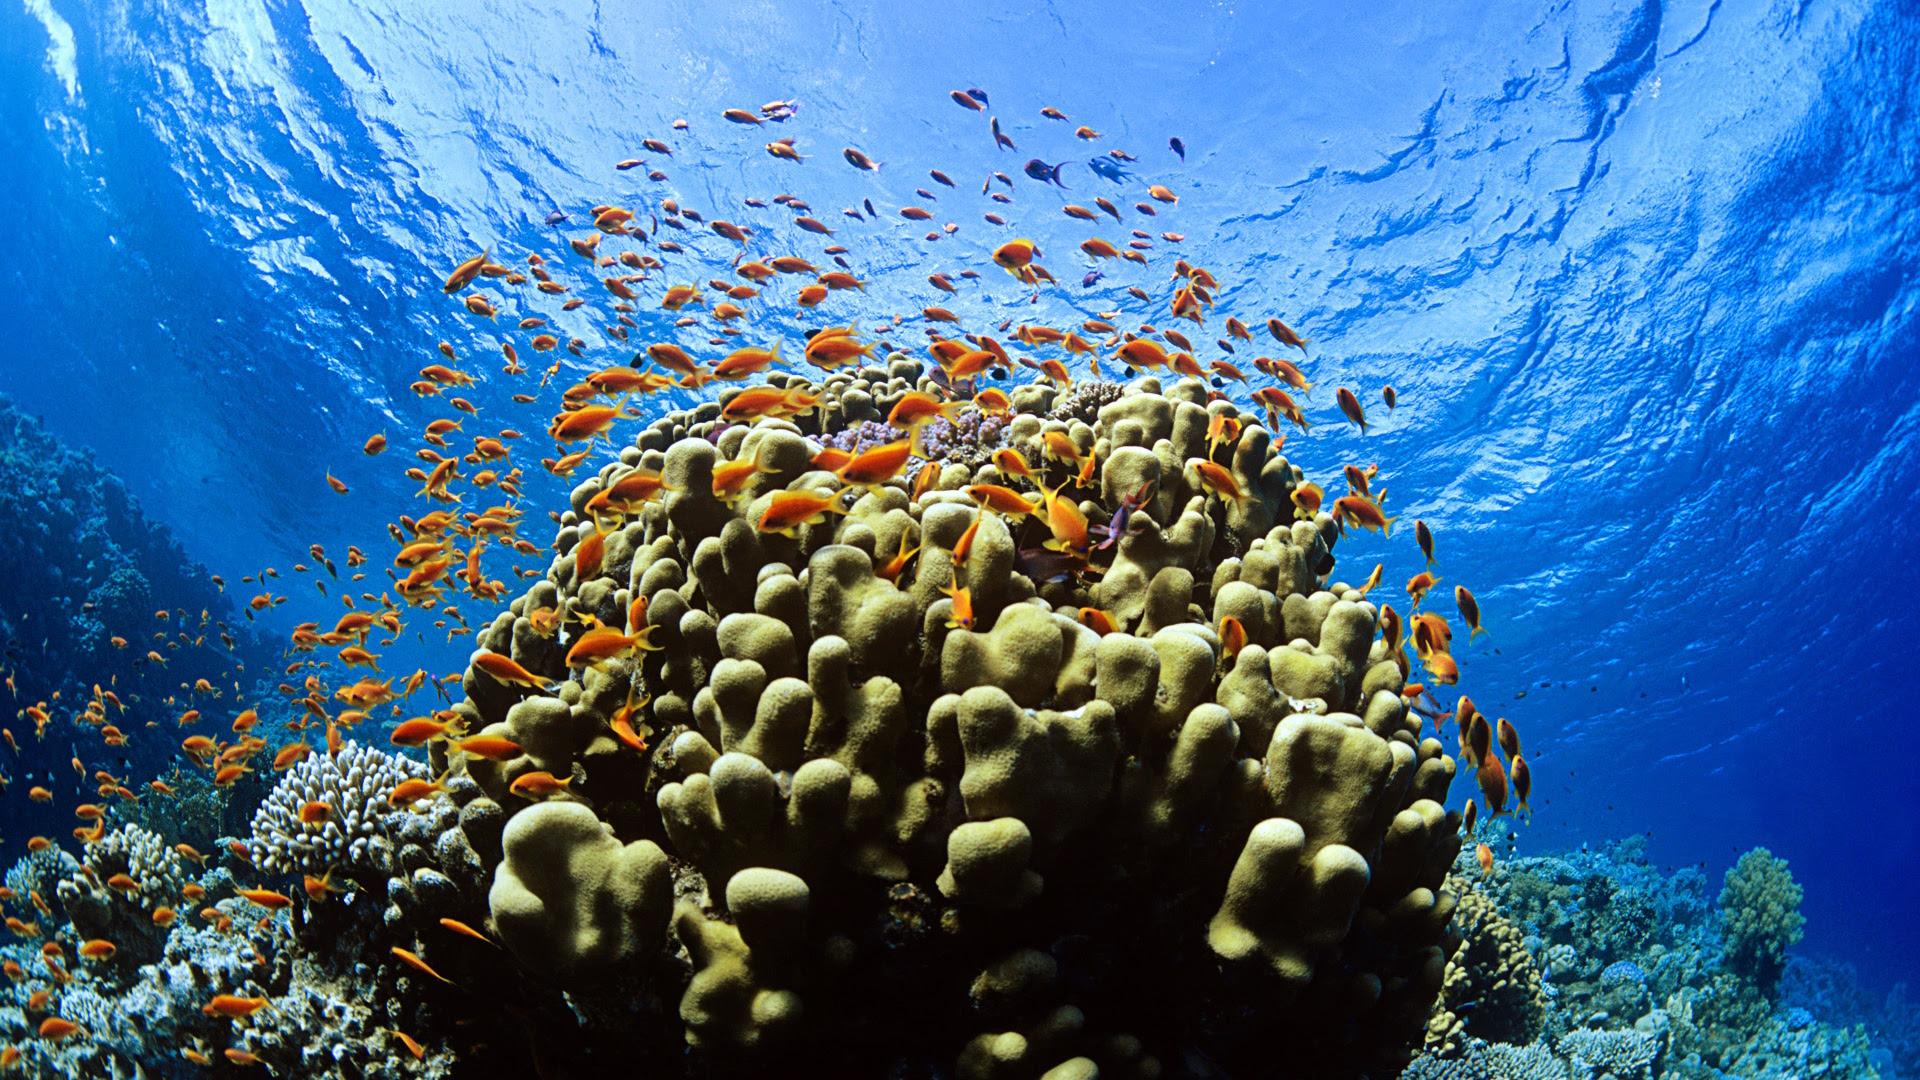 Underwater Sea Fish [1920x1080]